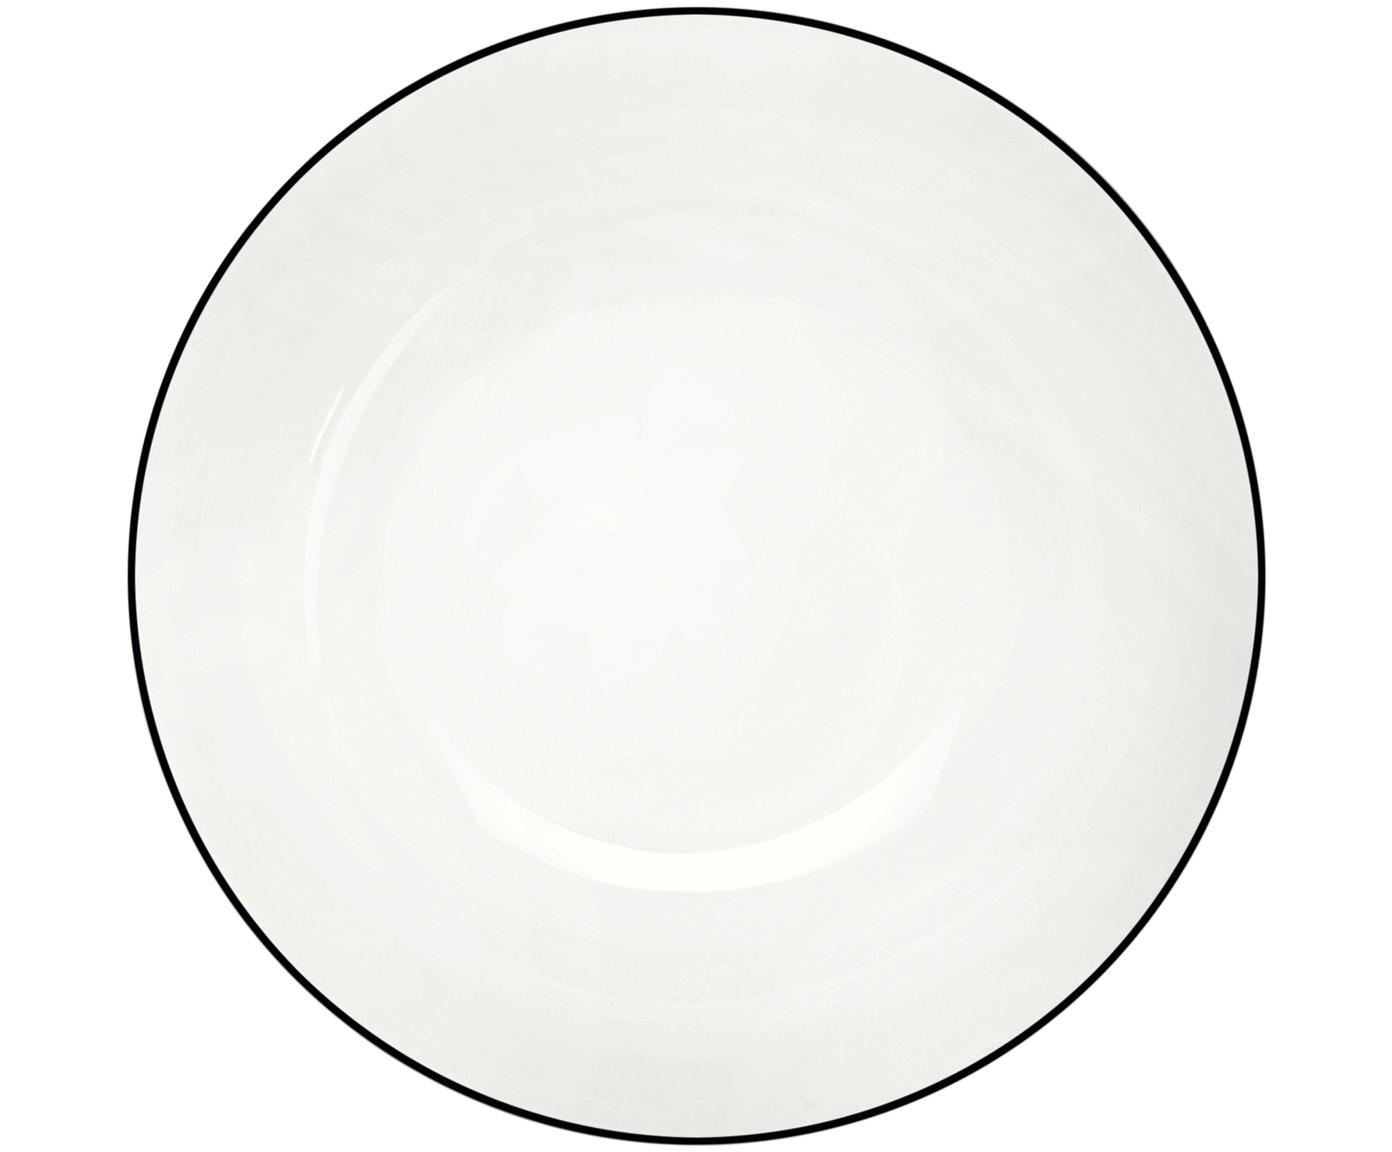 Platos de postre á table ligne noir, 4uds., Porcelana fina, Blanco Borde: negro, Ø 21 cm